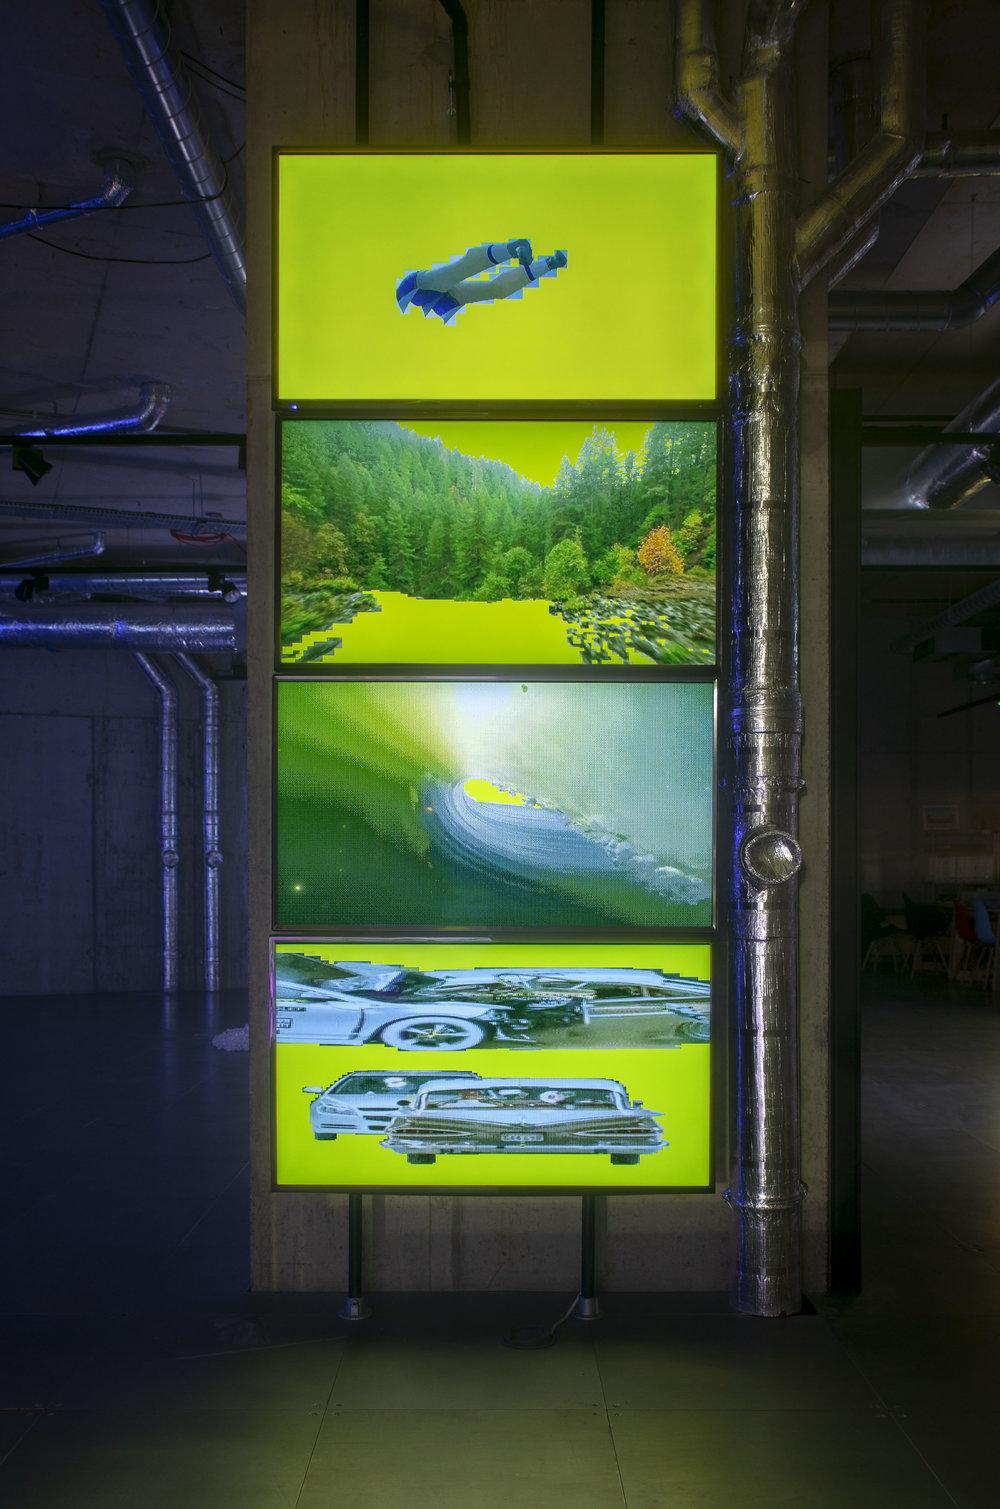 Lorna Mills - Yellowwhirlaway (2017) 4-channel Animated GIF installation